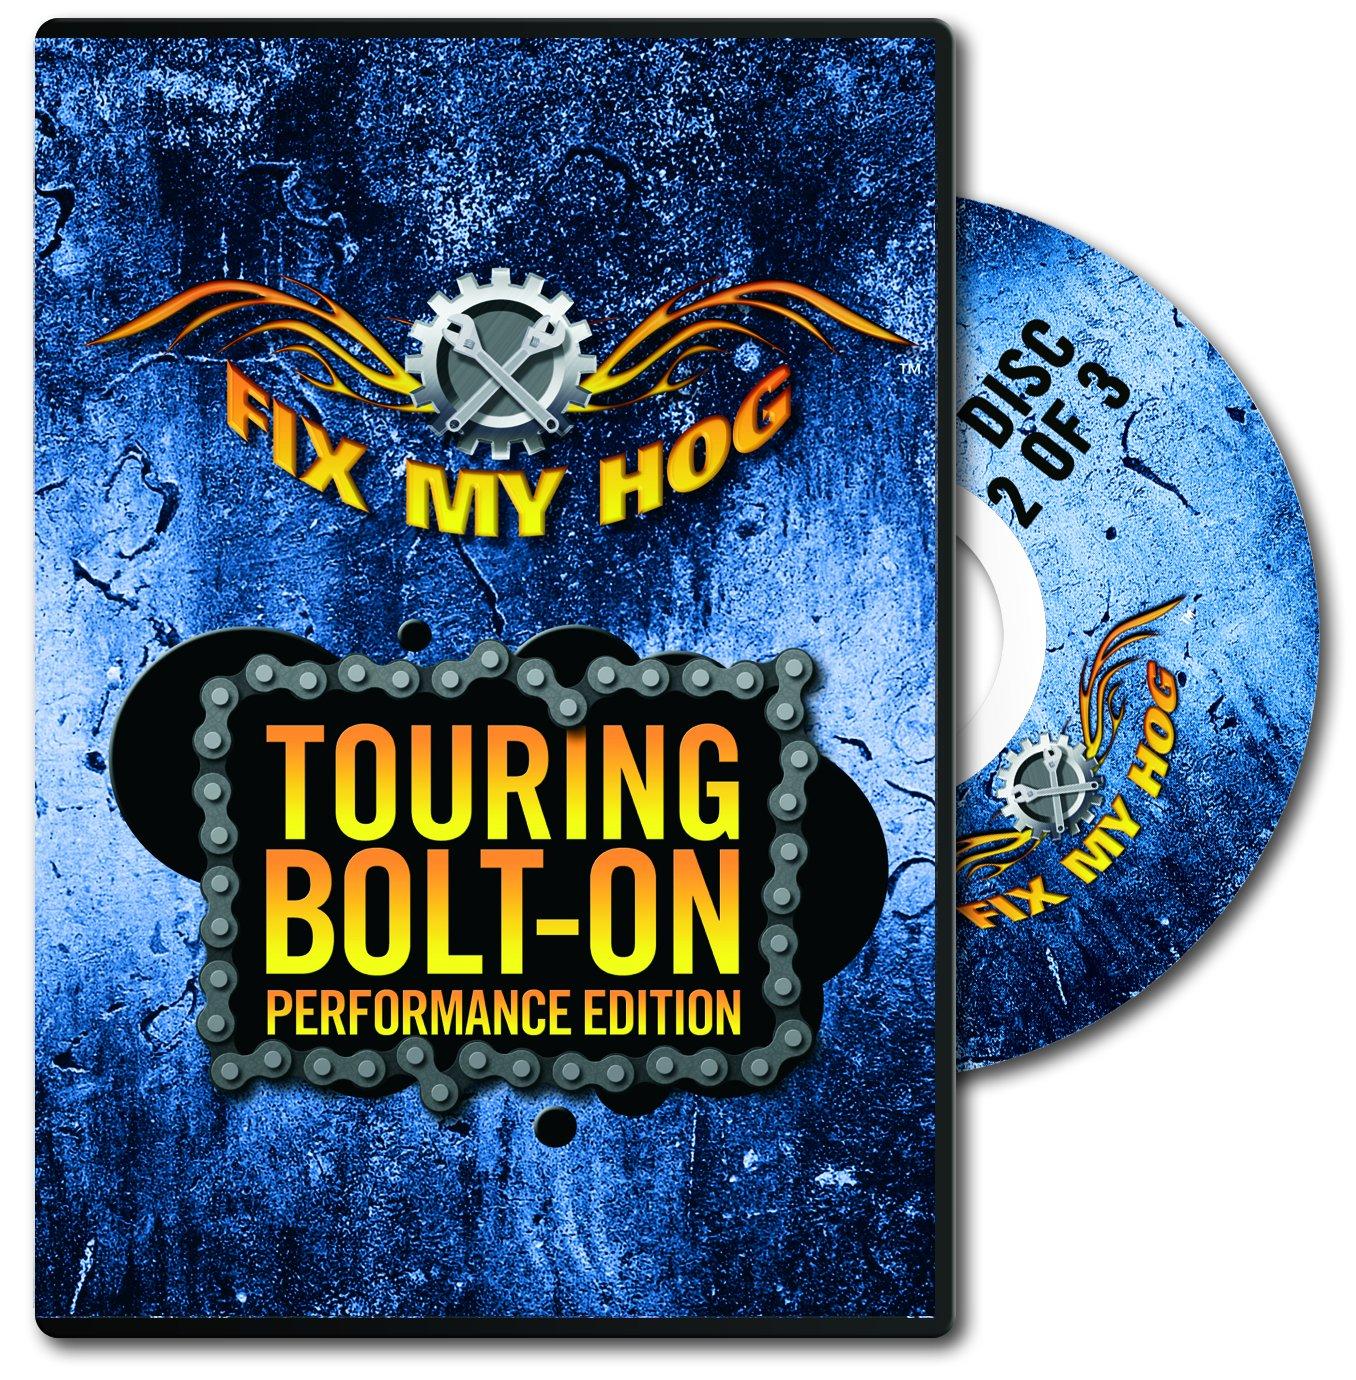 touringbolton-hi